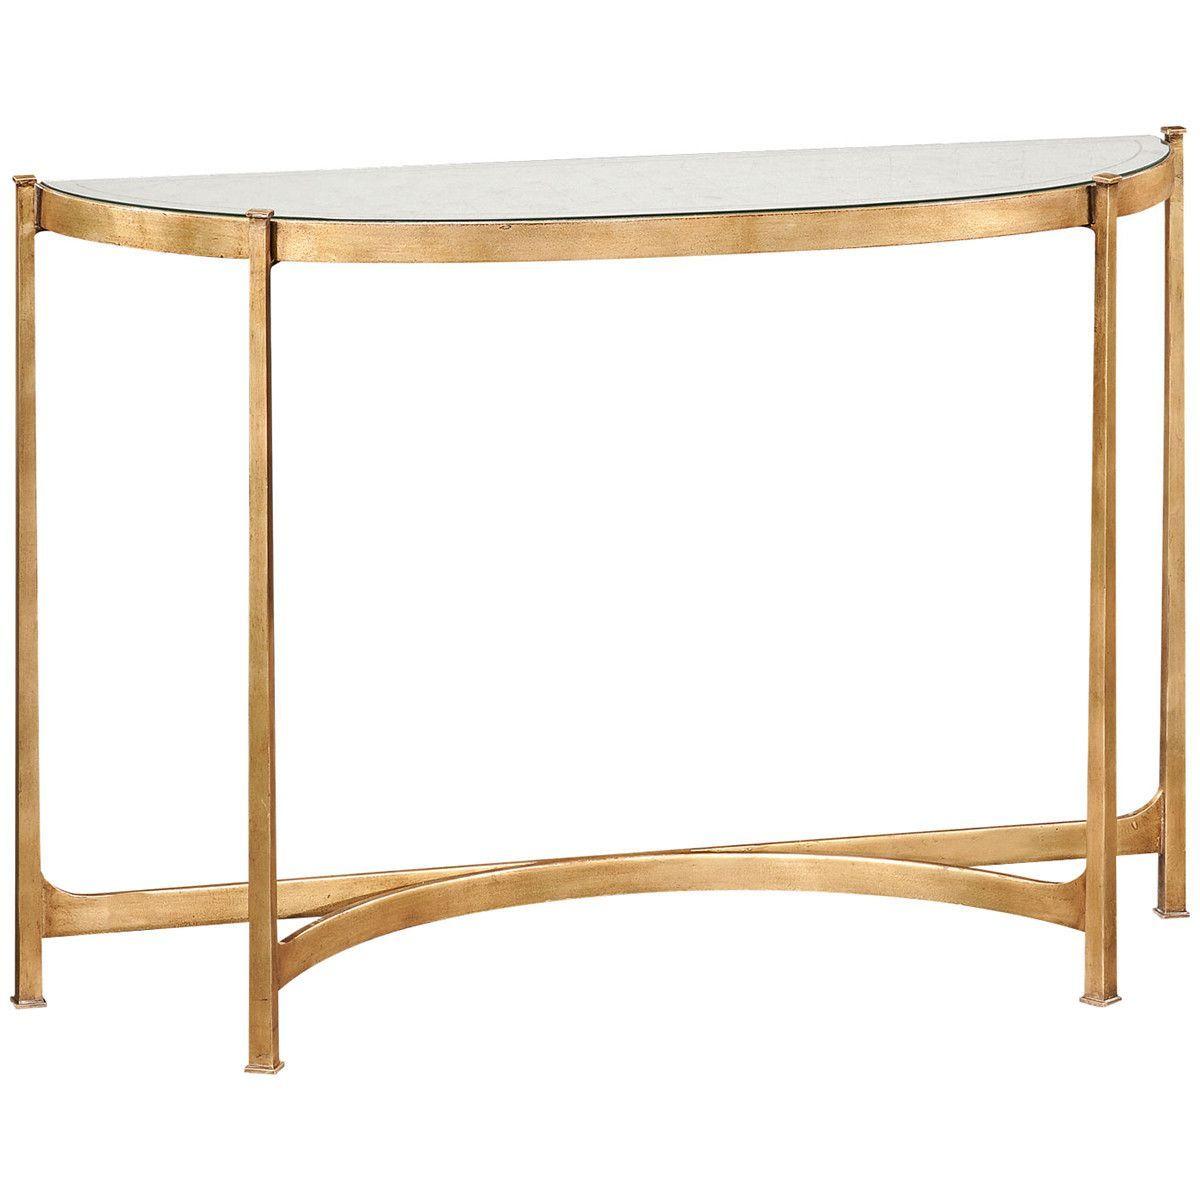 Tremendous Available In Bronze Gold Silver Contemporary Wrought Inzonedesignstudio Interior Chair Design Inzonedesignstudiocom